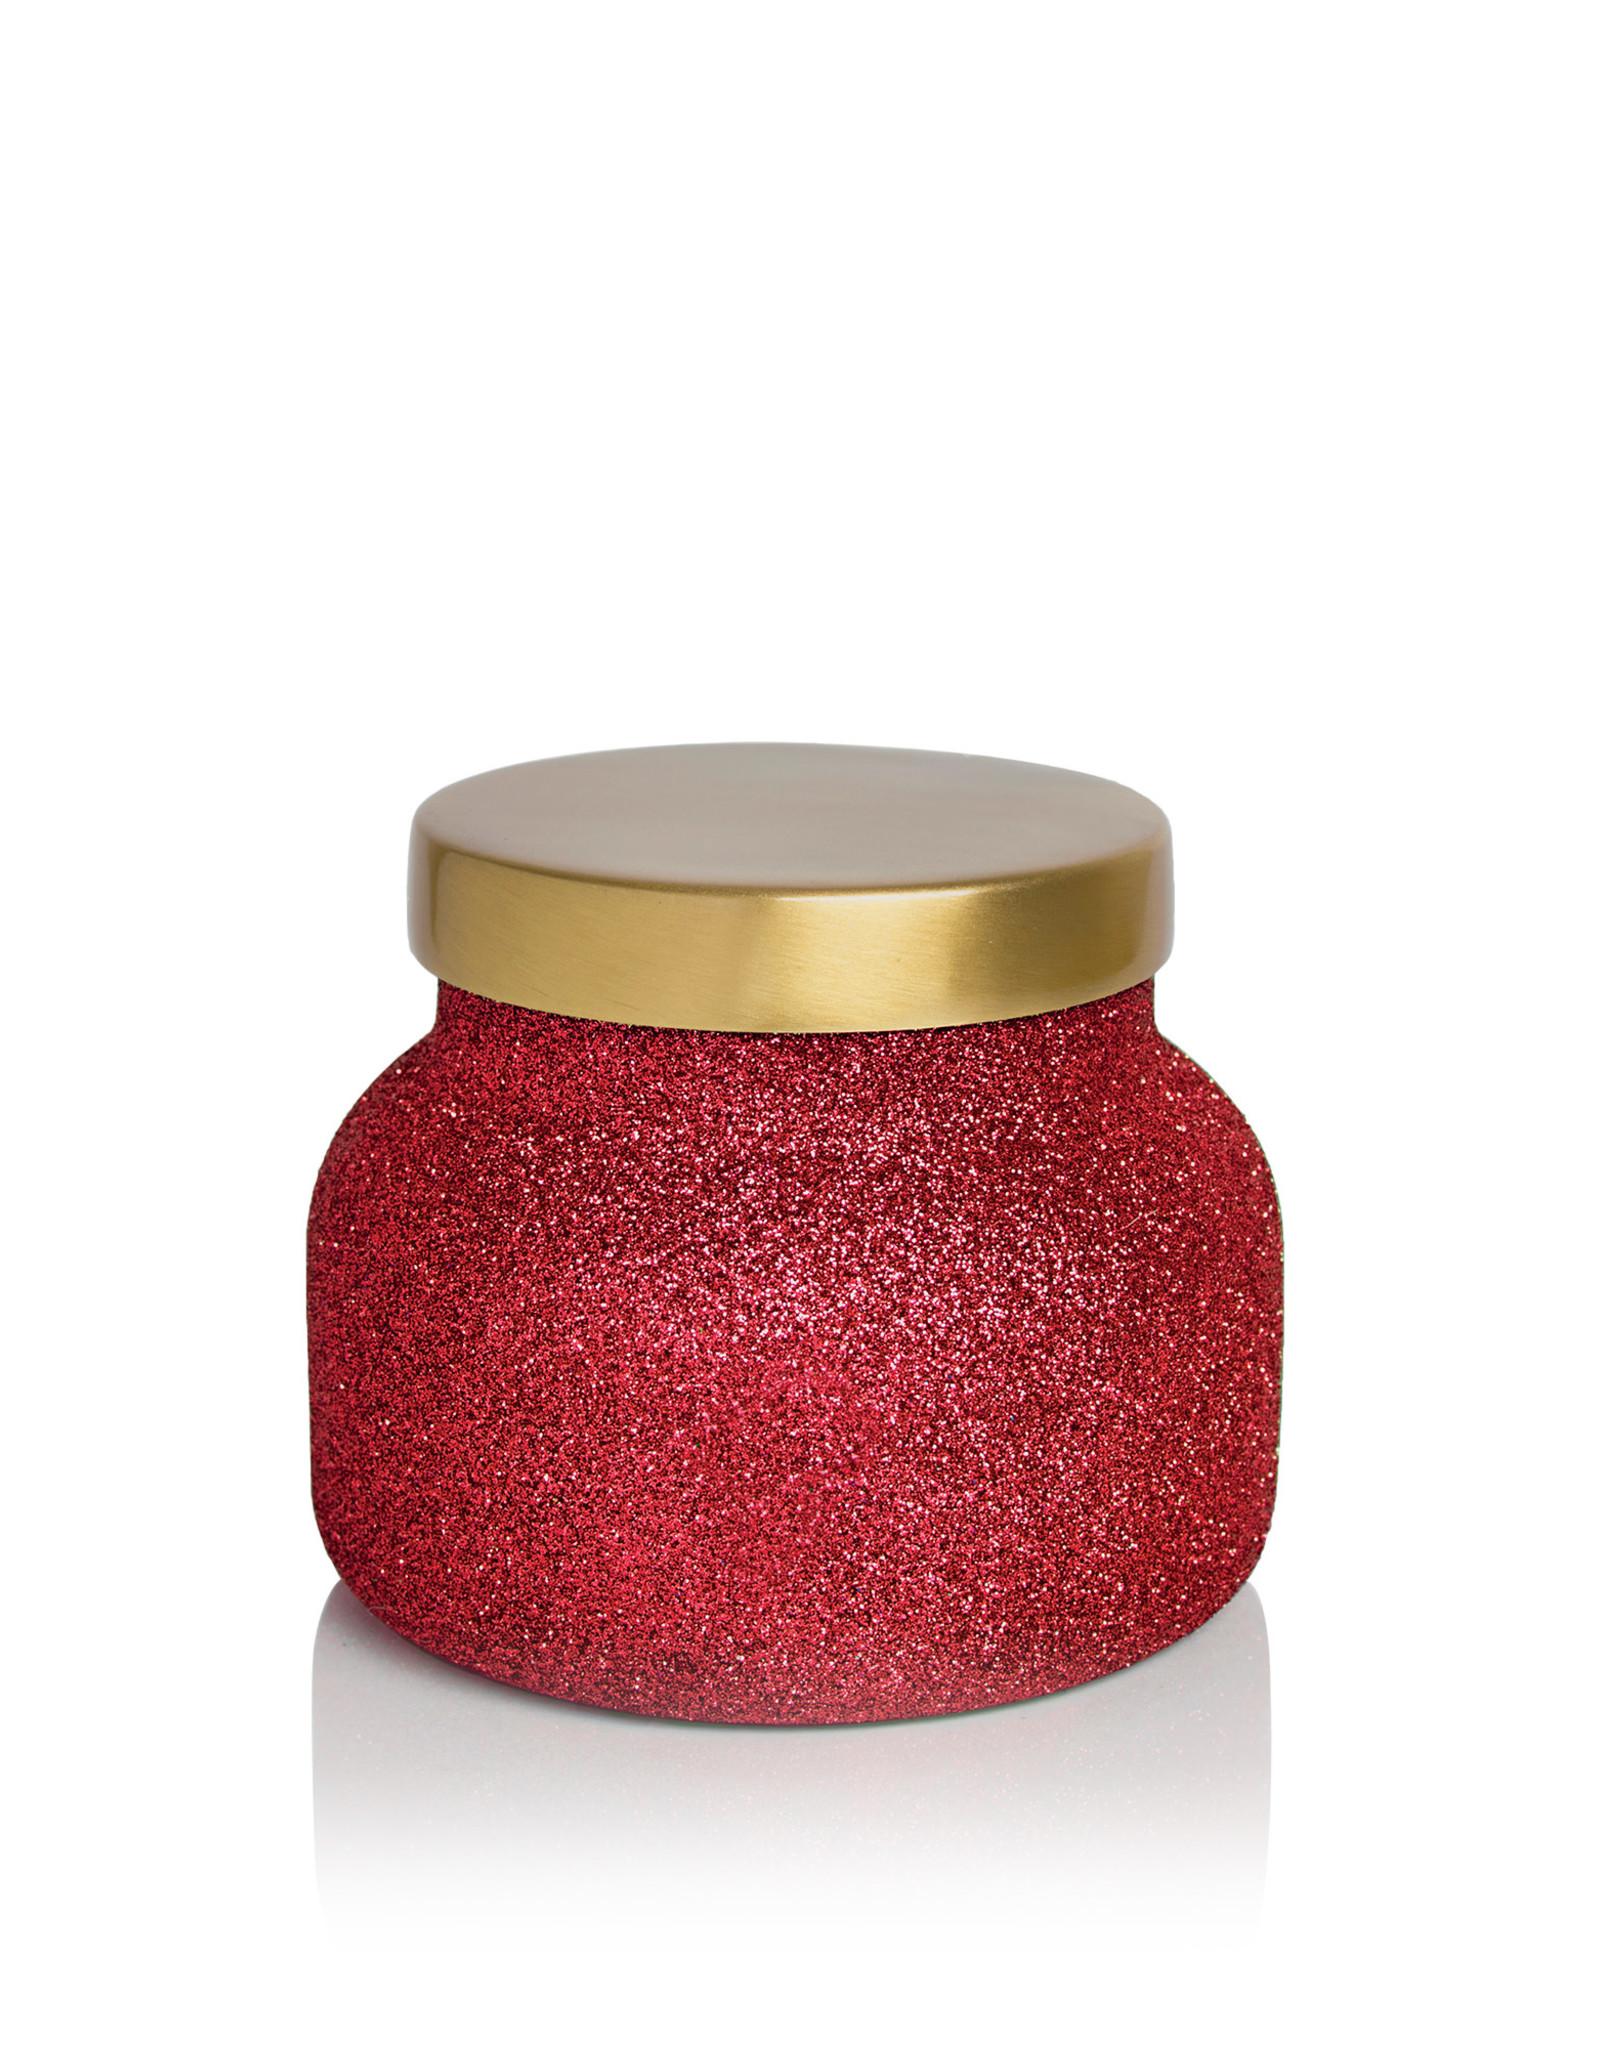 capri BLUE® Volcano Glam Jar